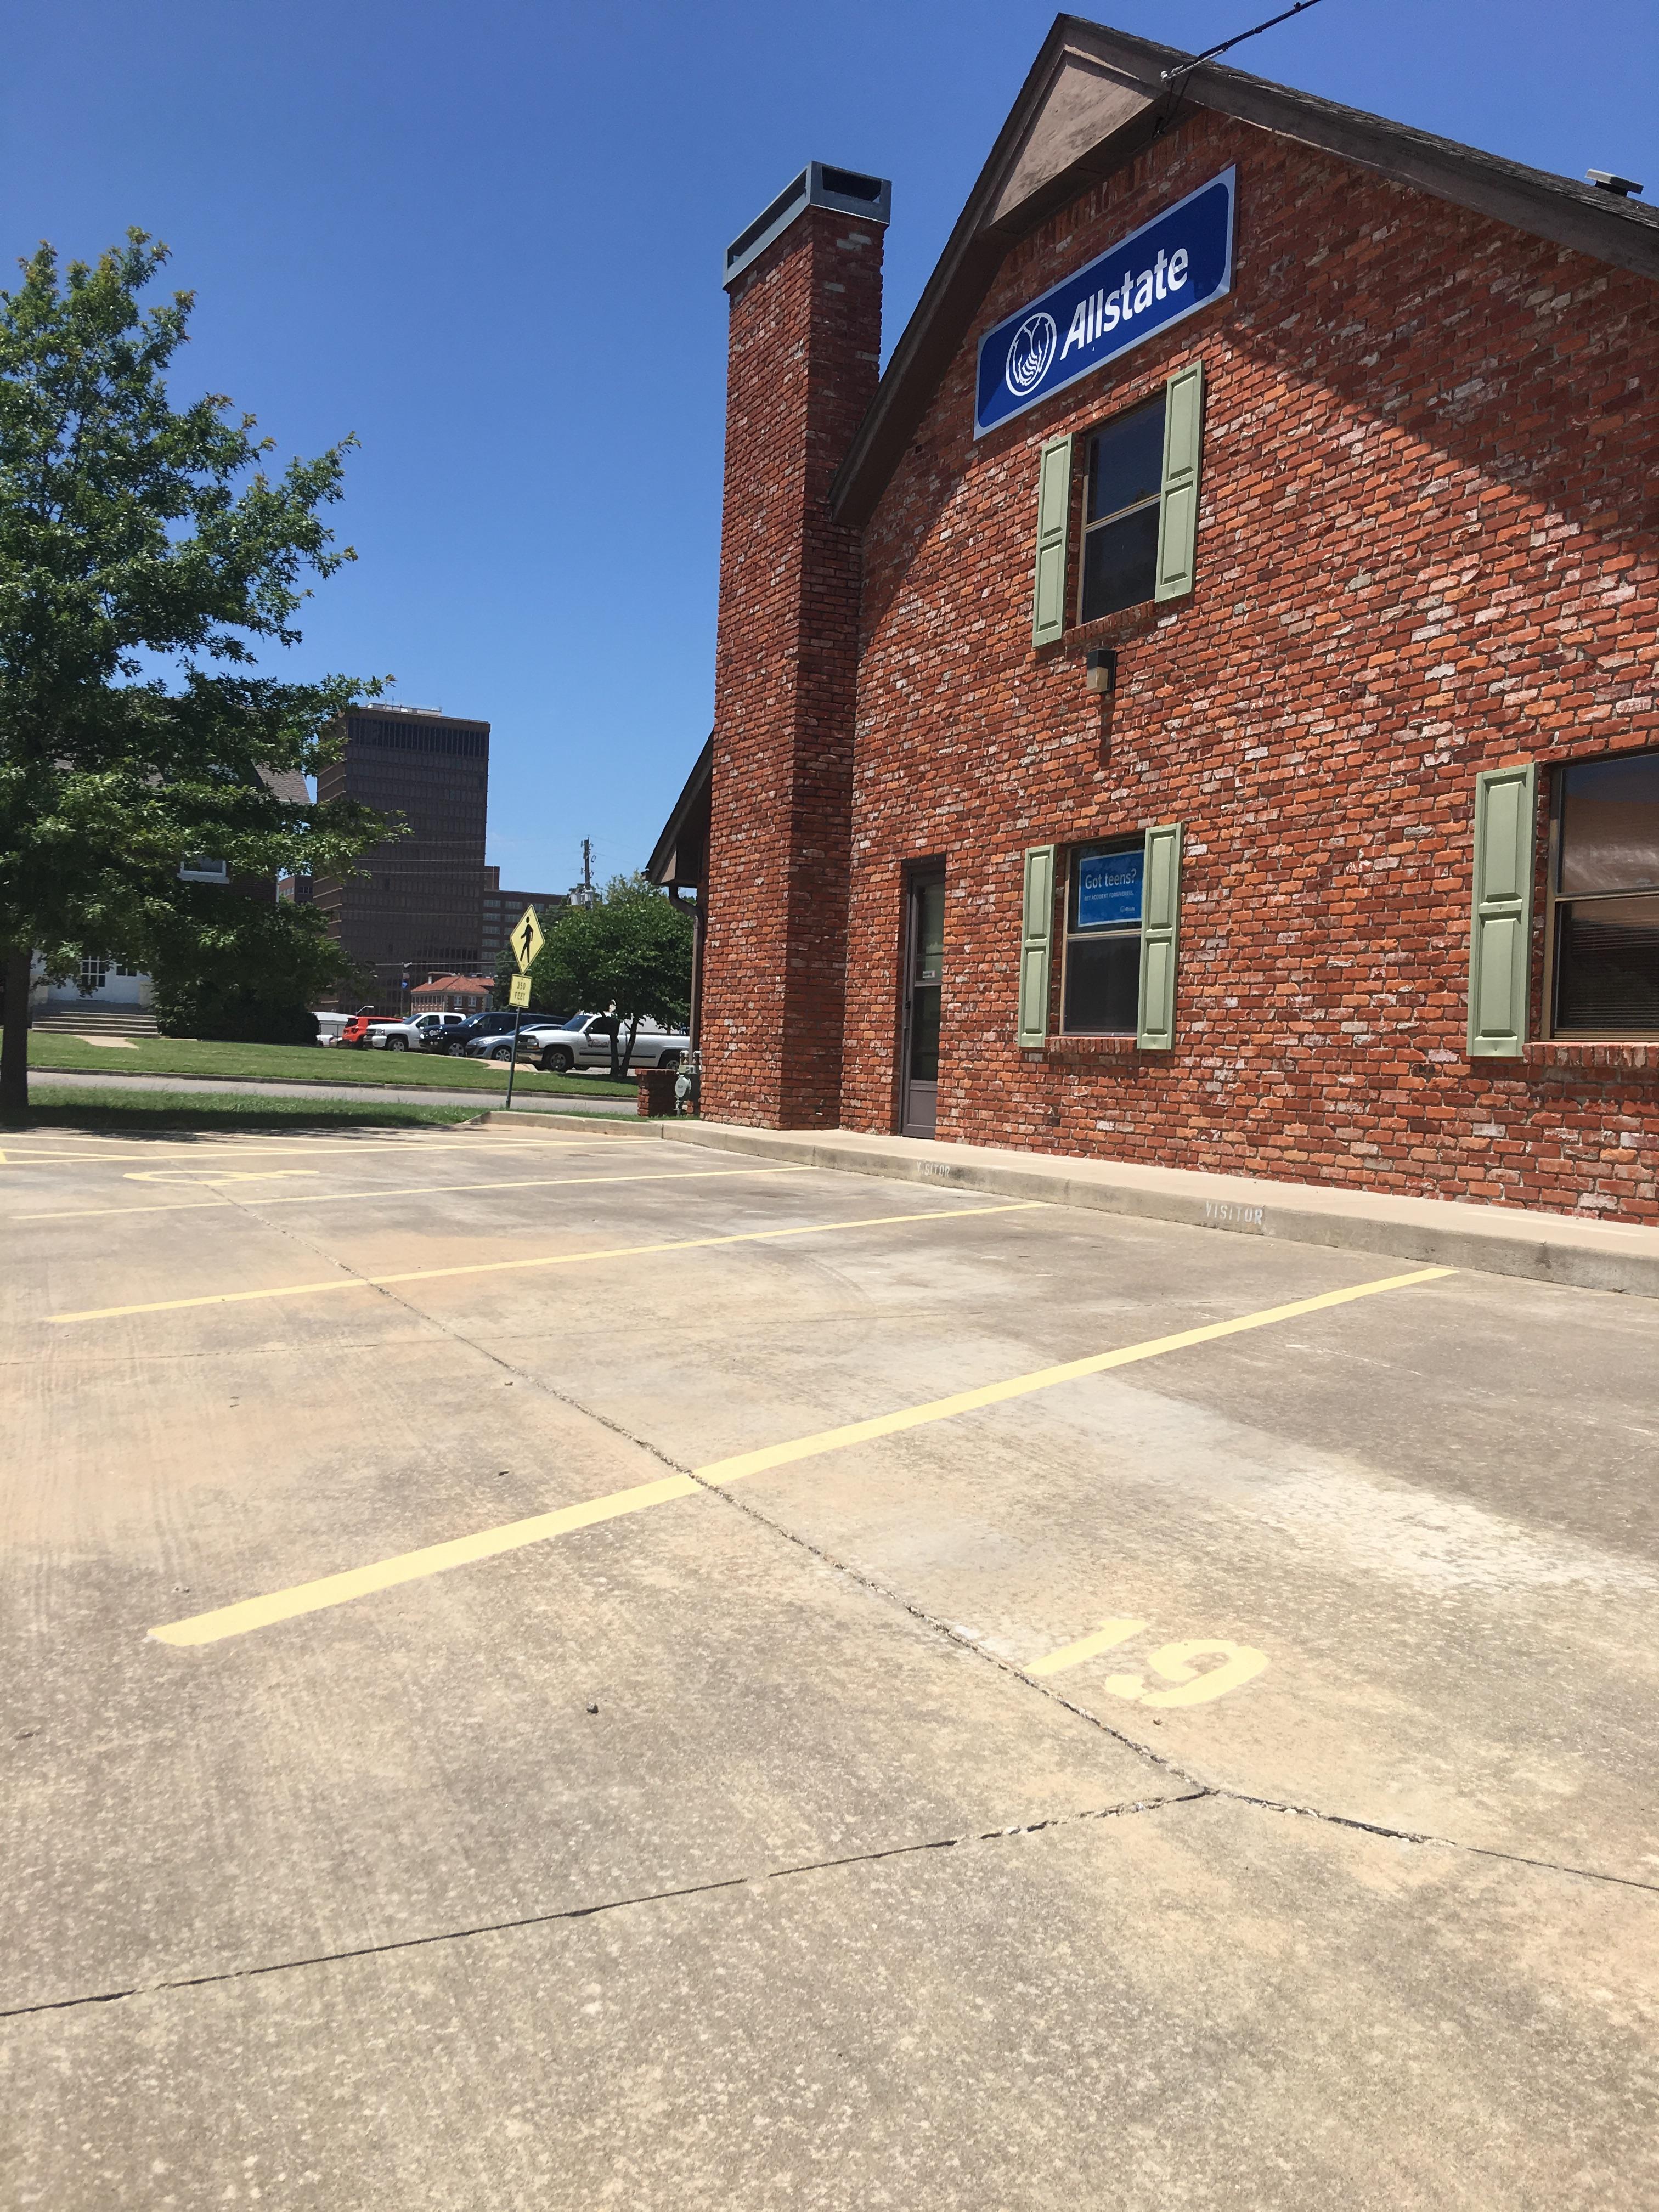 Jason Bilhartz: Allstate Insurance image 6